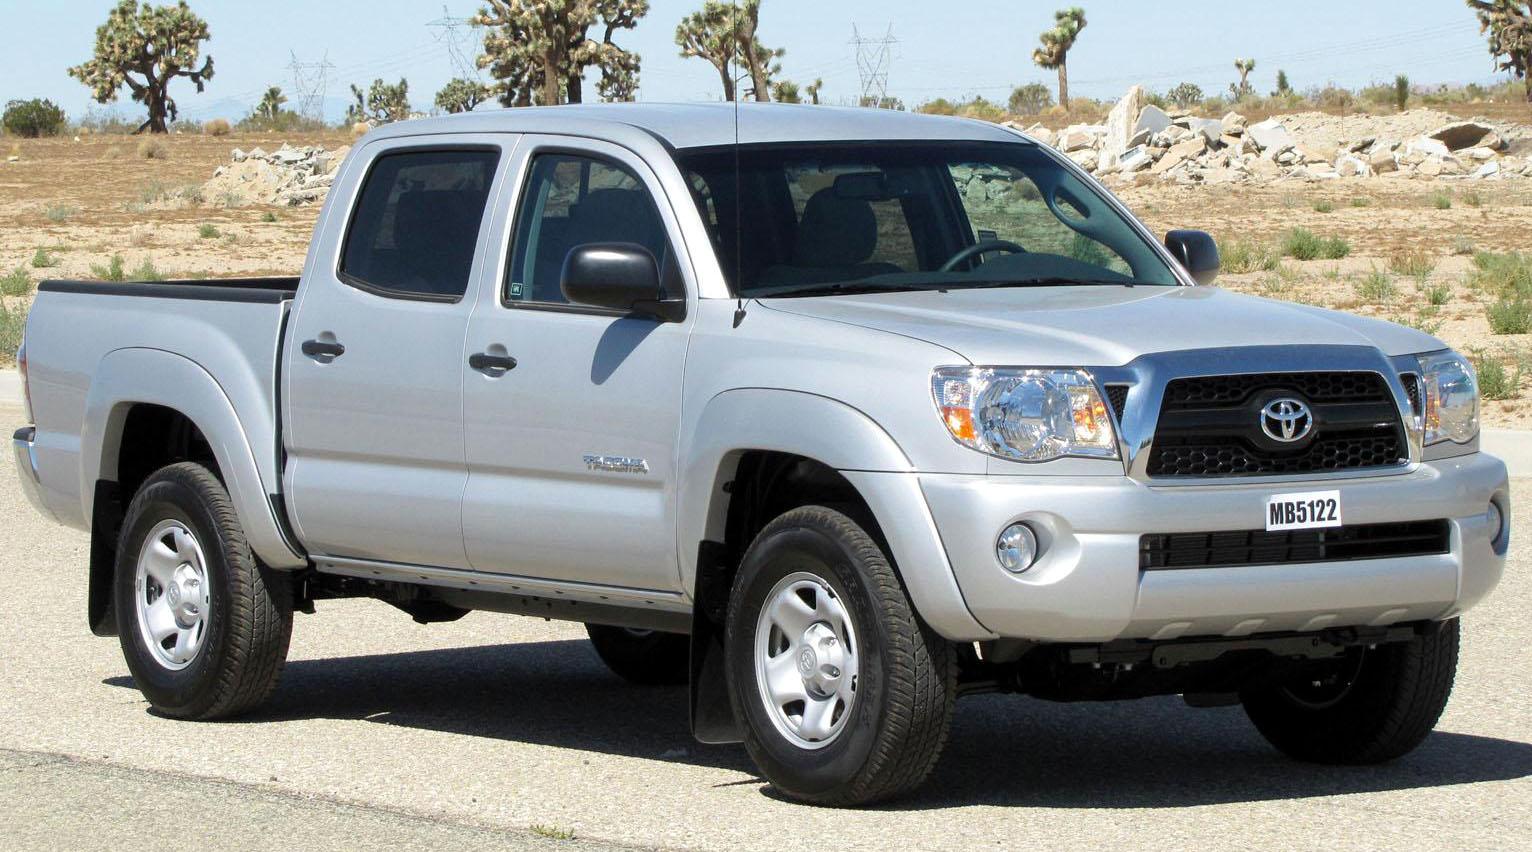 Toyota Truck Exhaust Diagram - Block And Schematic Diagrams •